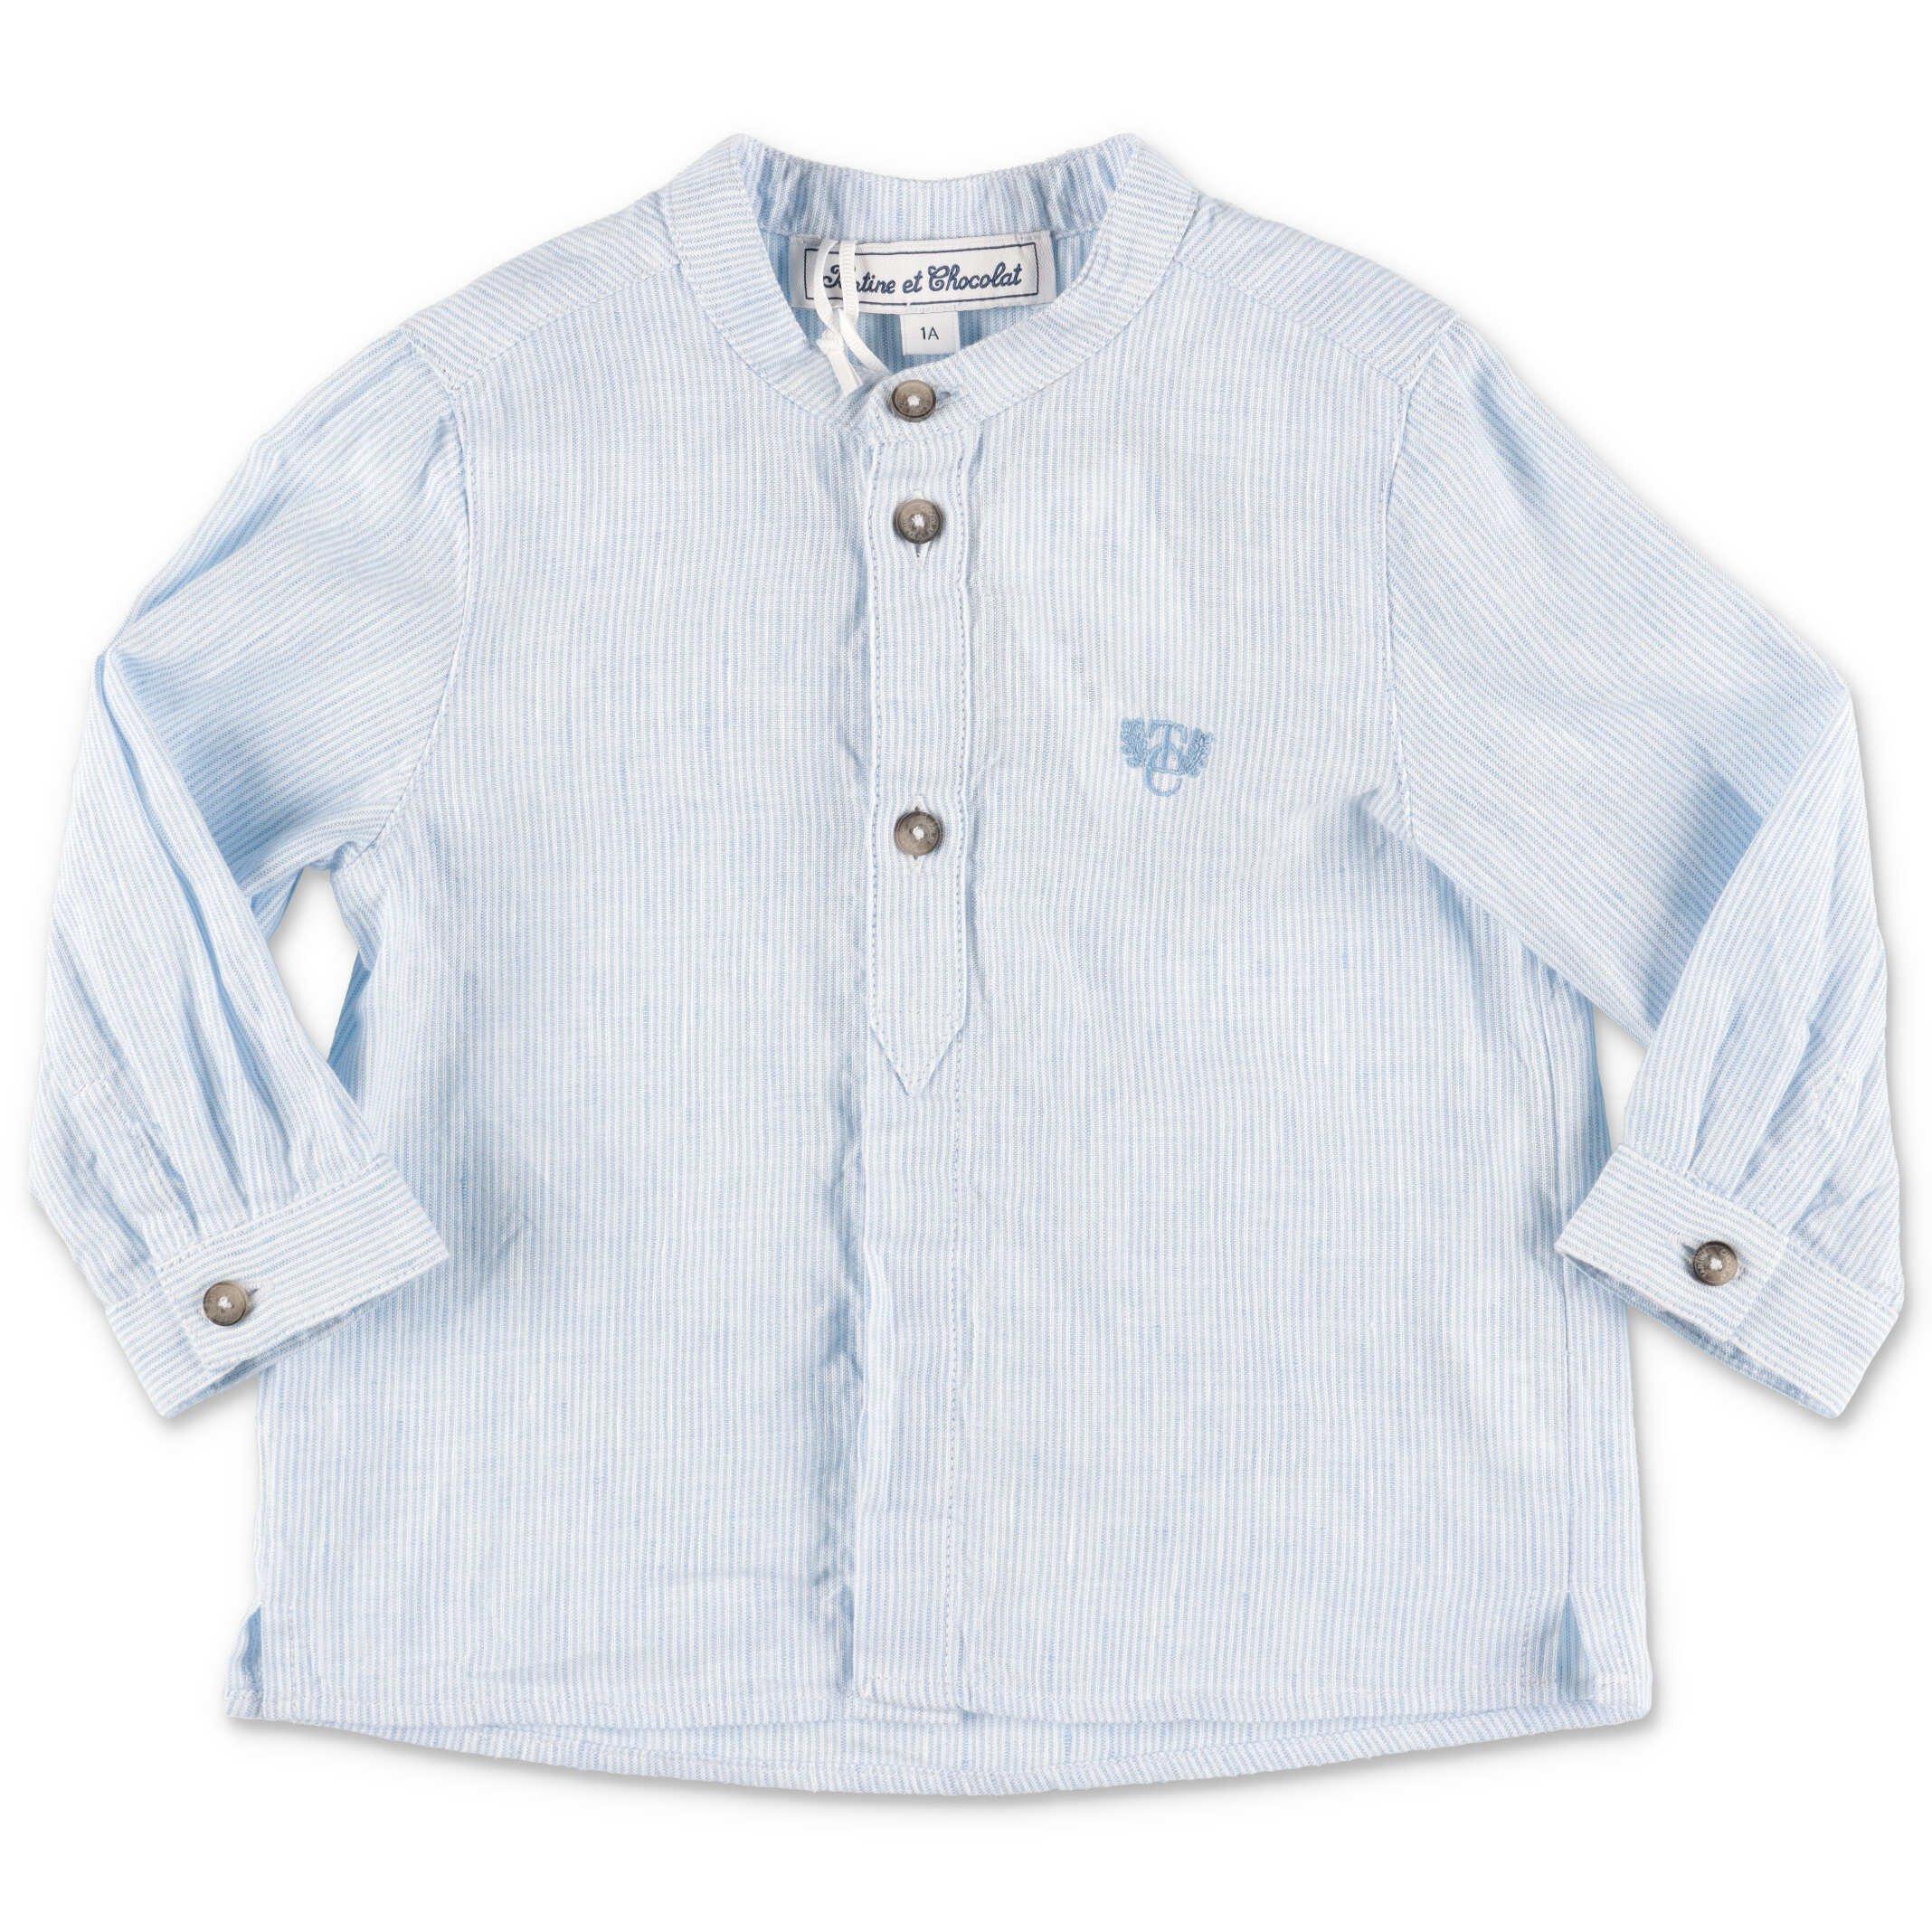 Tartine et Chocolat shirt light blue striped cotton baby boy